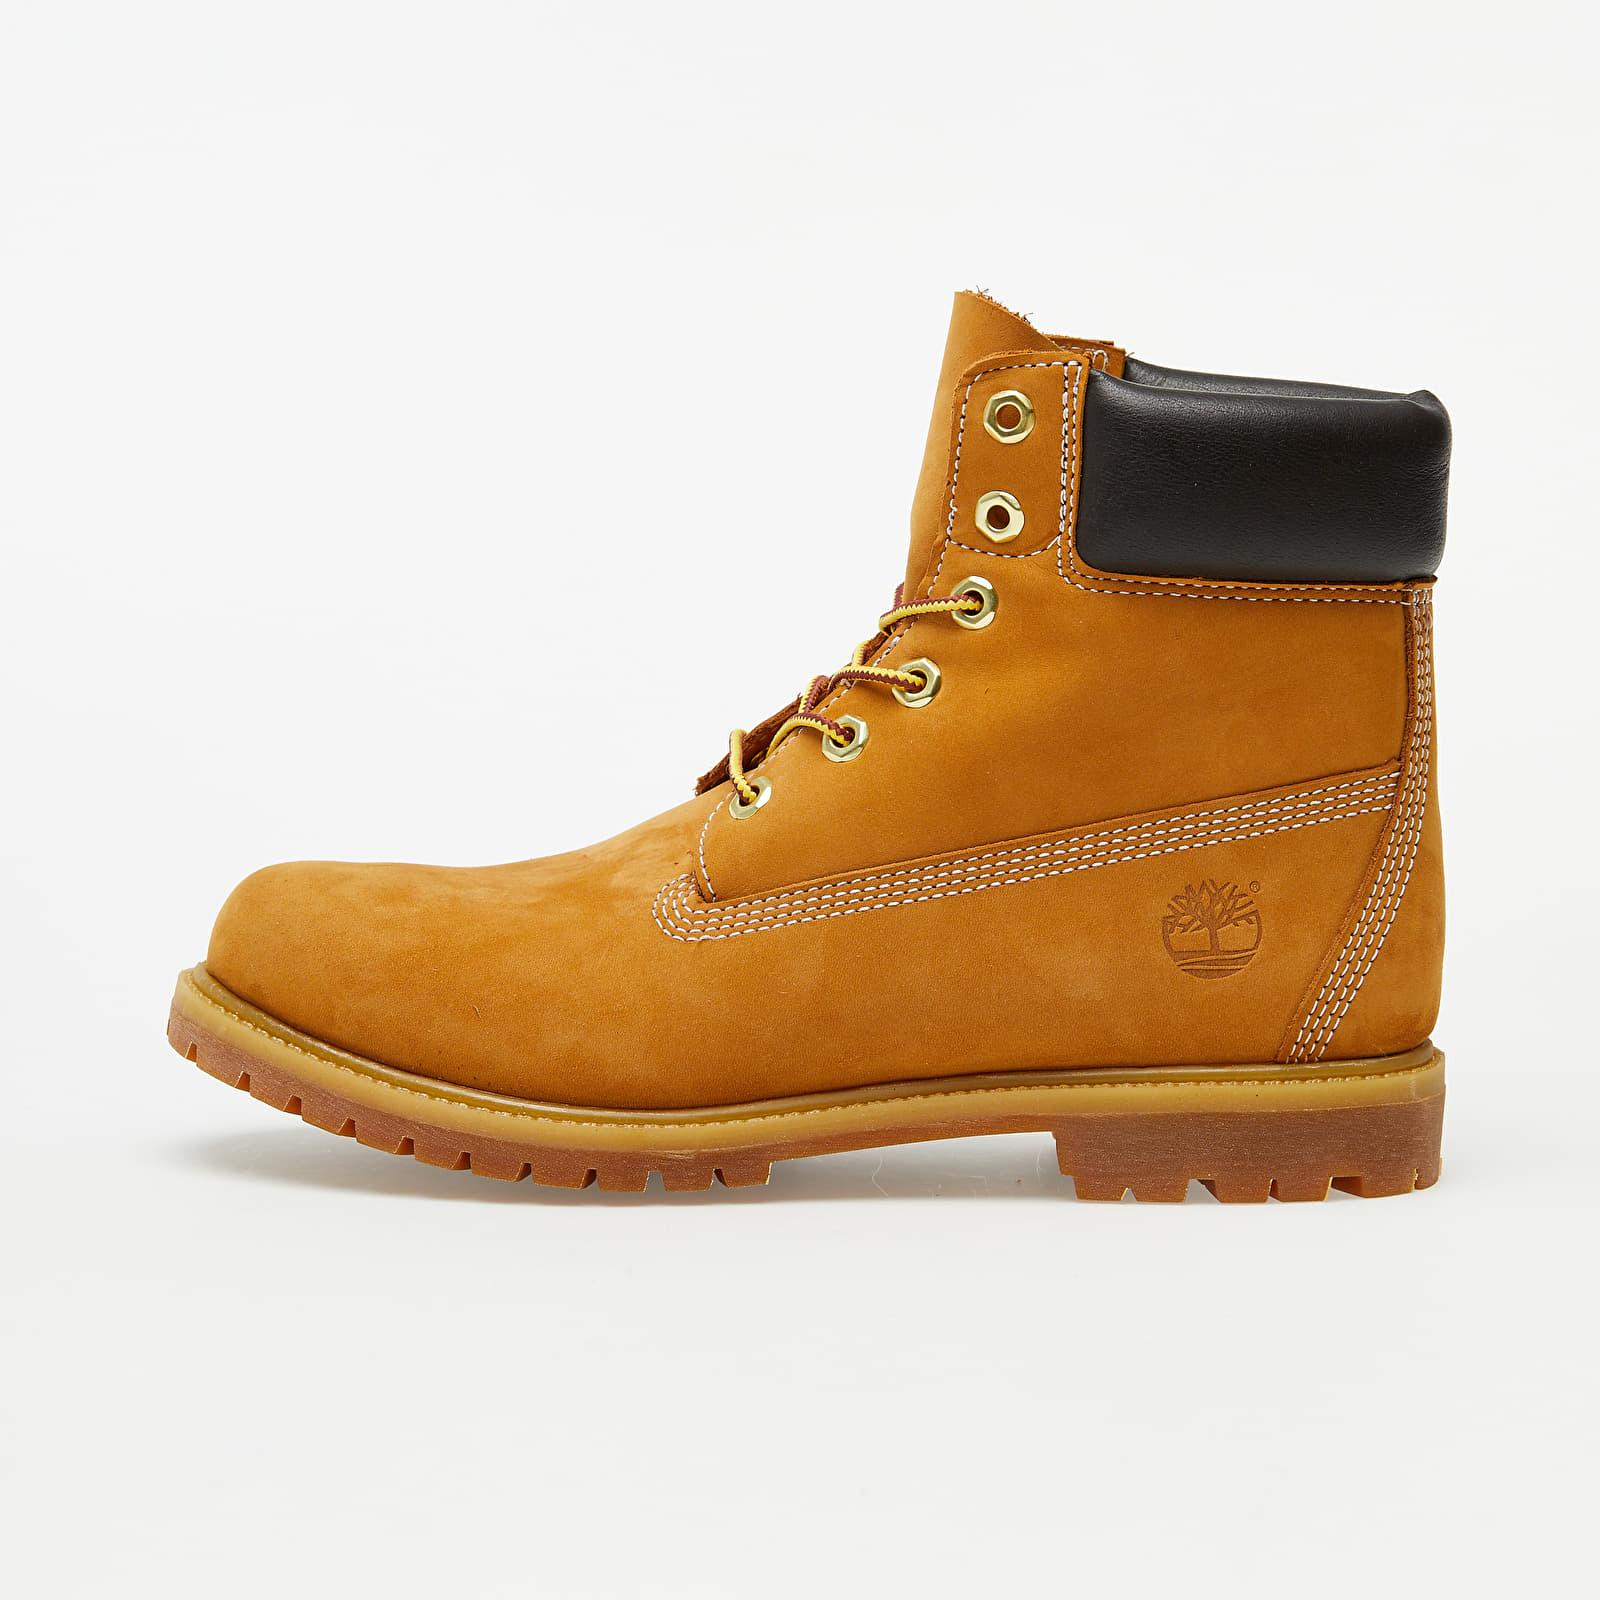 Scarpe e sneaker da donna Timberland Premium 6 In Waterproof Boot Wheat Nubuck